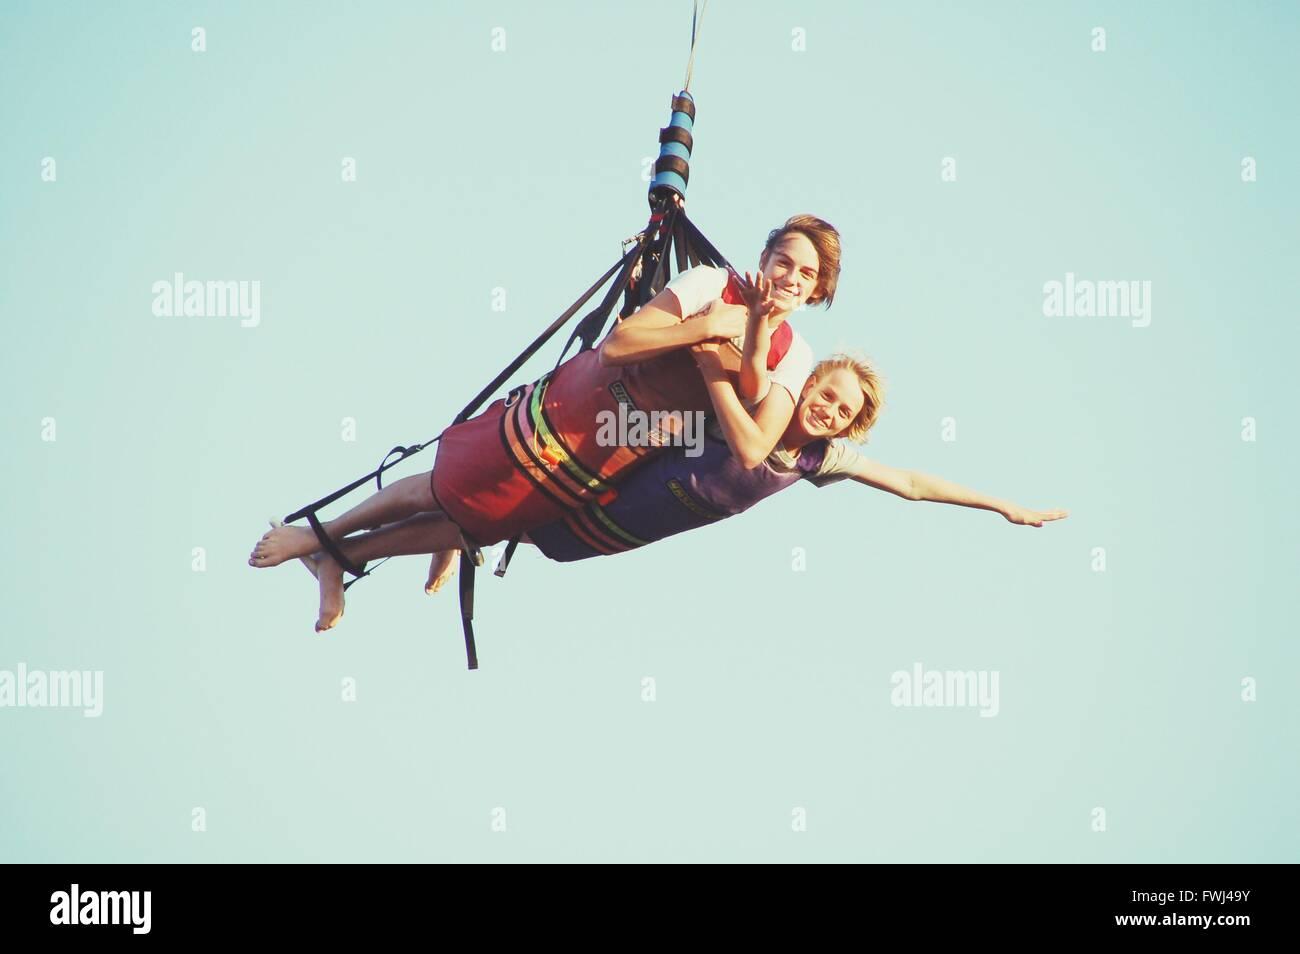 Low Angle View Of Couple Hang Gliding - Stock Image